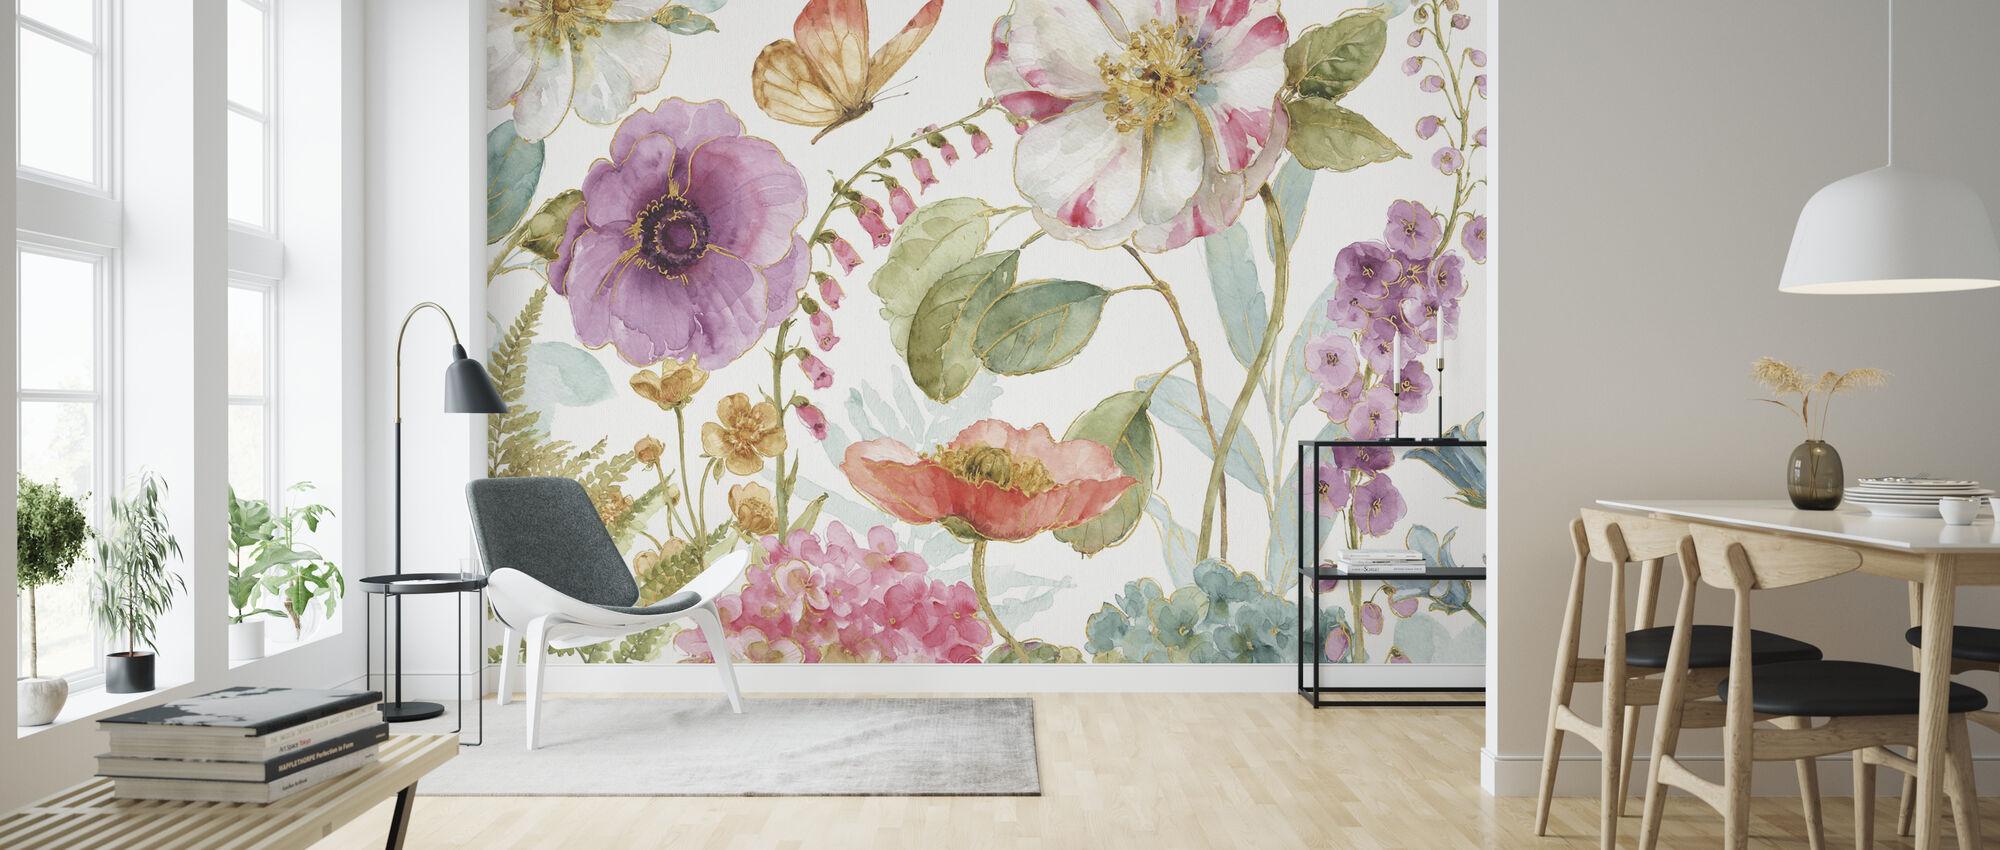 Regnbåge Frön Blommor 1 - Tapet - Vardagsrum